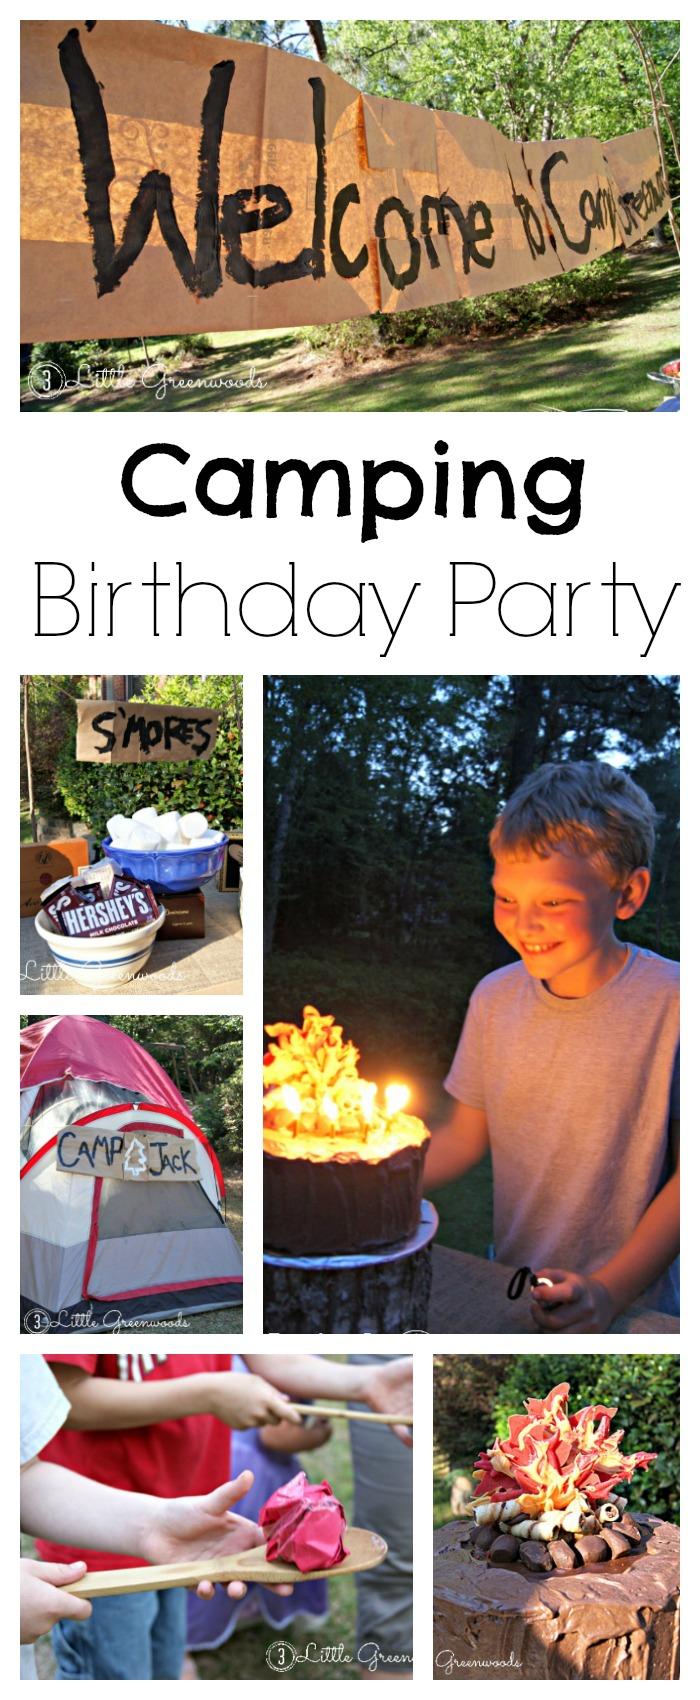 18.camping birthday party fun for backyard camping party ideas via SIMPHOME.COM